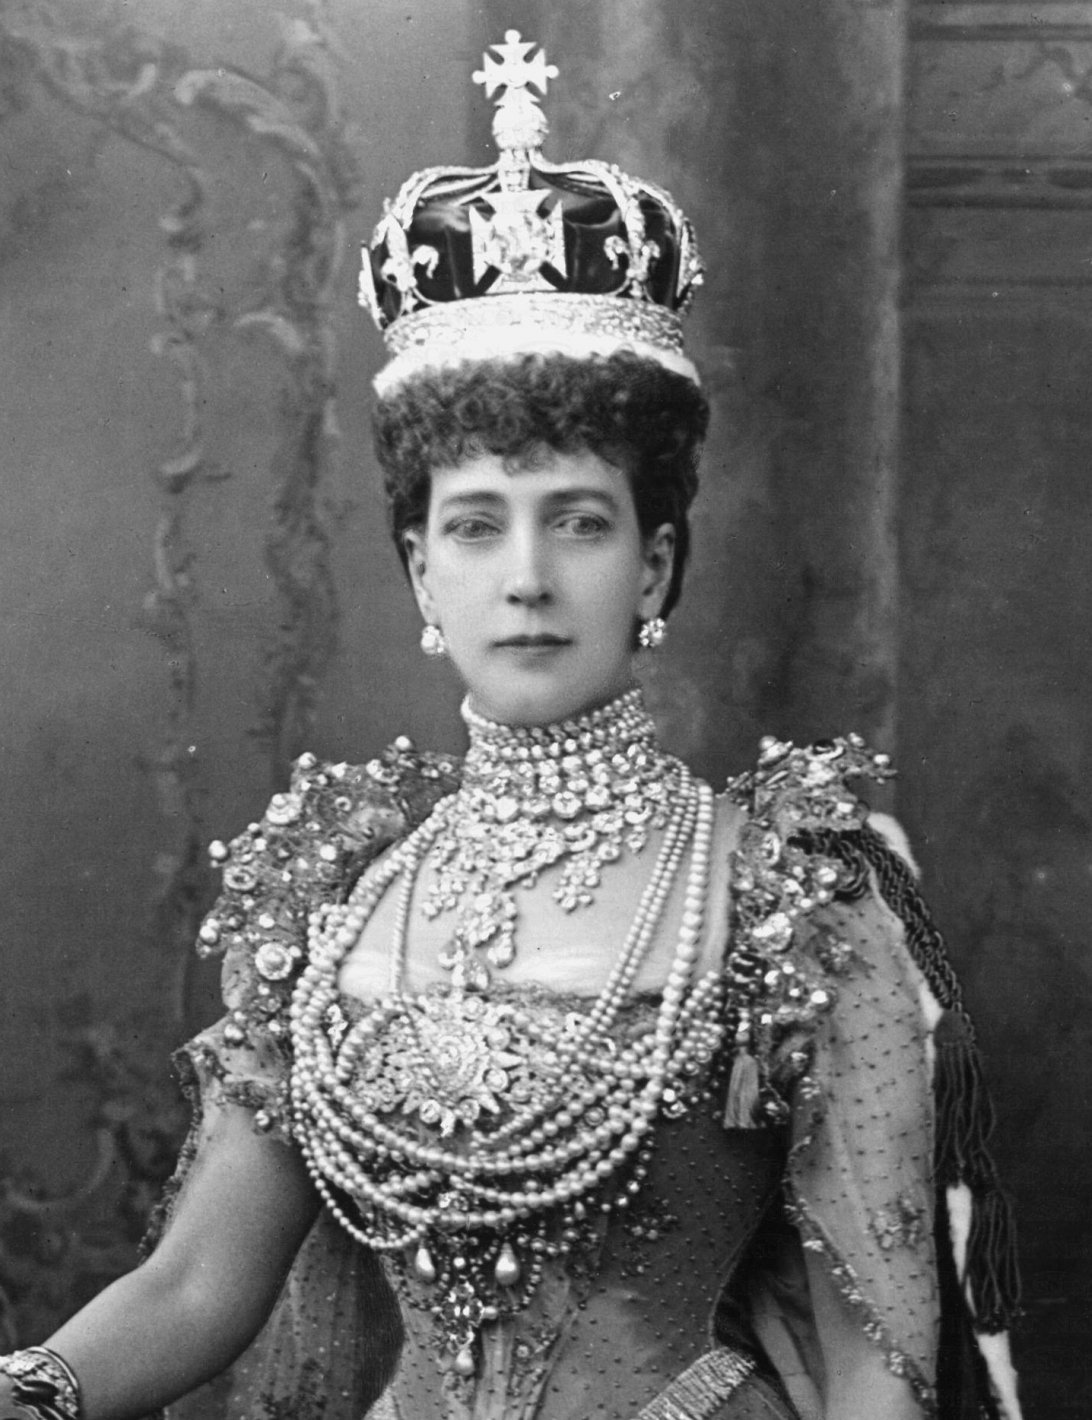 Alexandra of Denmark, queen of the United Kingdom, 1902